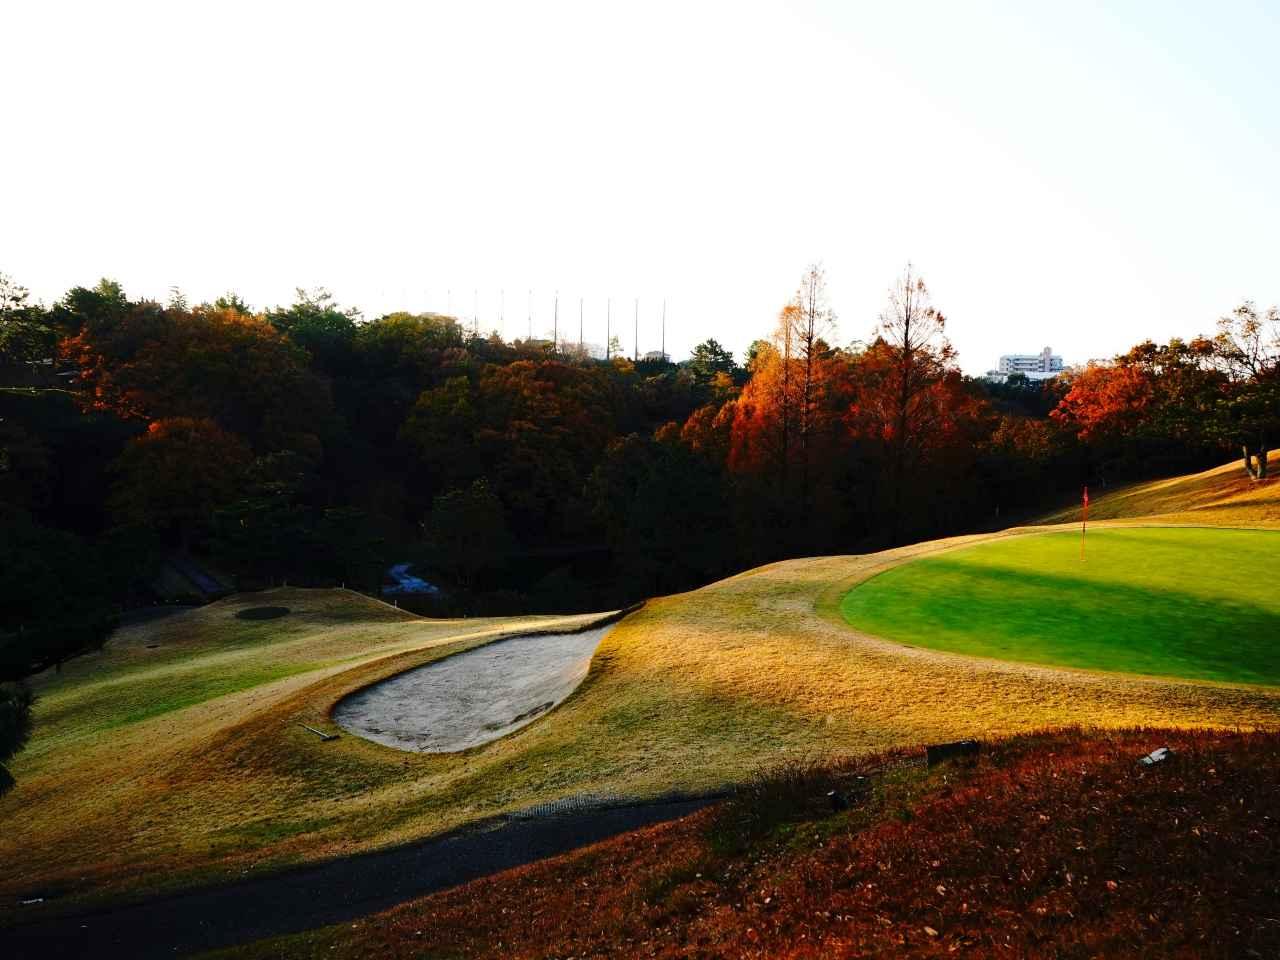 Images : 6番目の画像 - 垂水ゴルフ倶楽部 - ゴルフへ行こうWEB by ゴルフダイジェスト